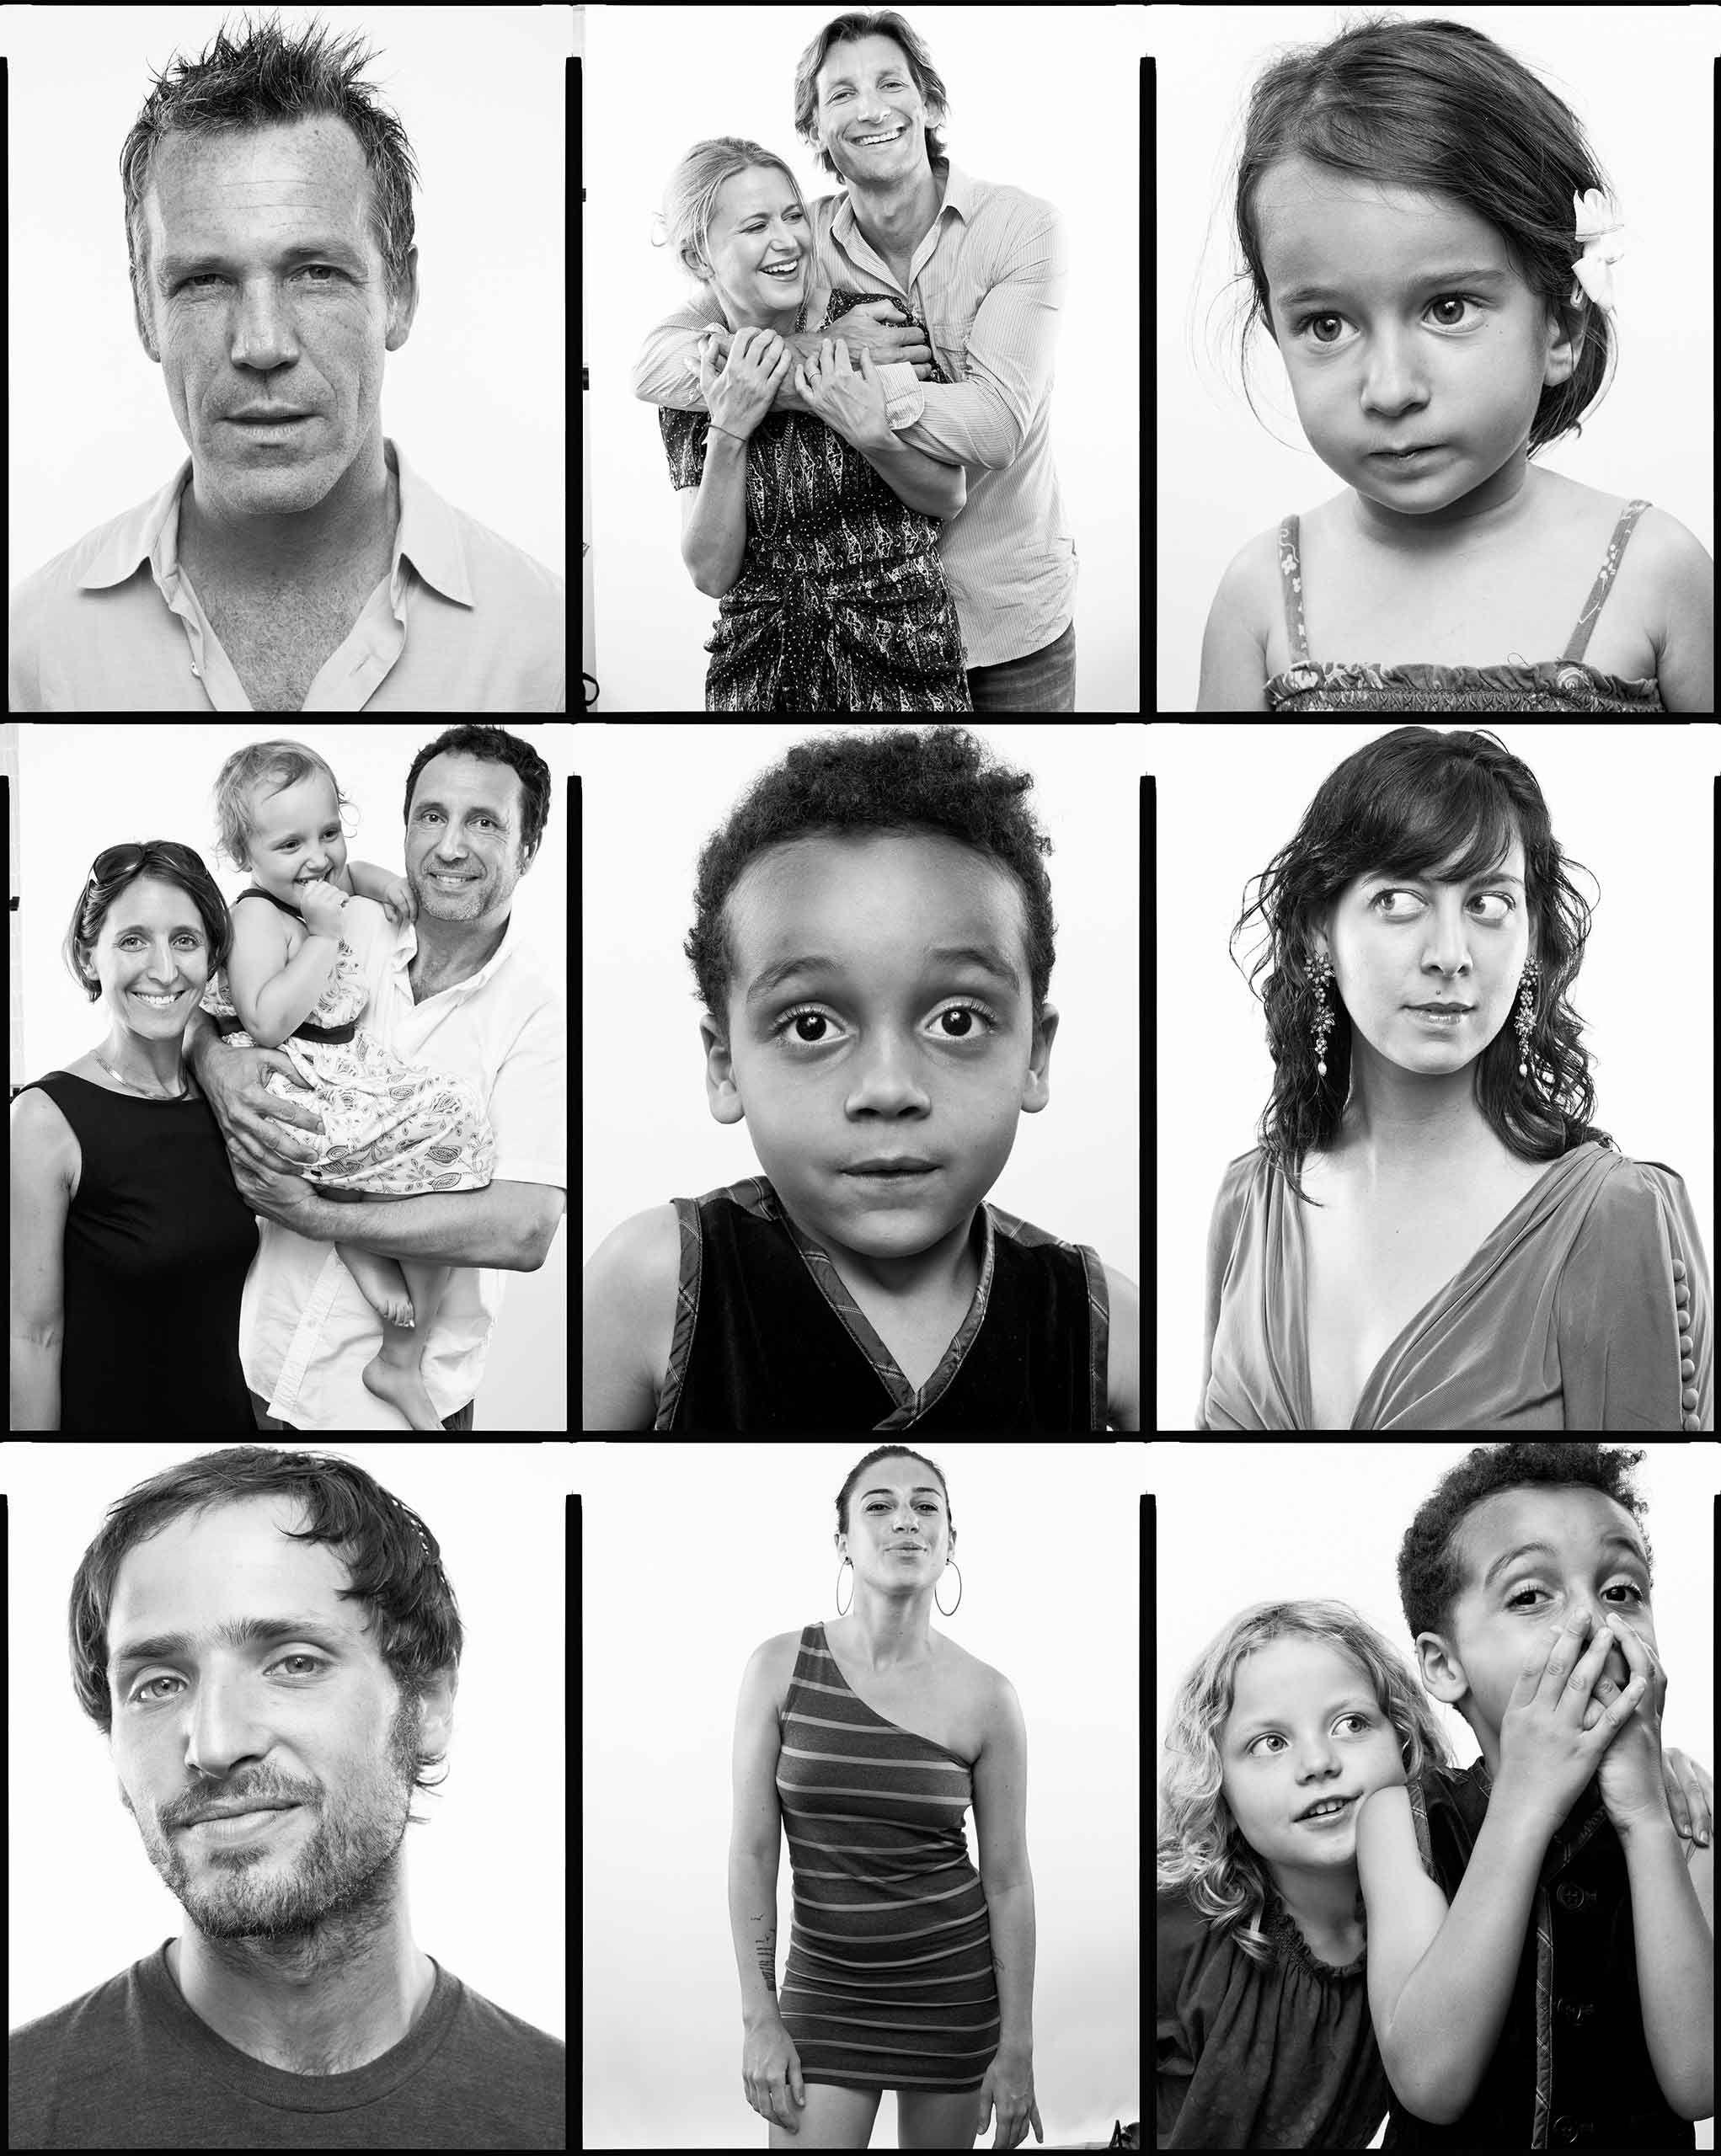 Portraits-on-white-times-nine-by-HenrikOlundPhotography.jpg